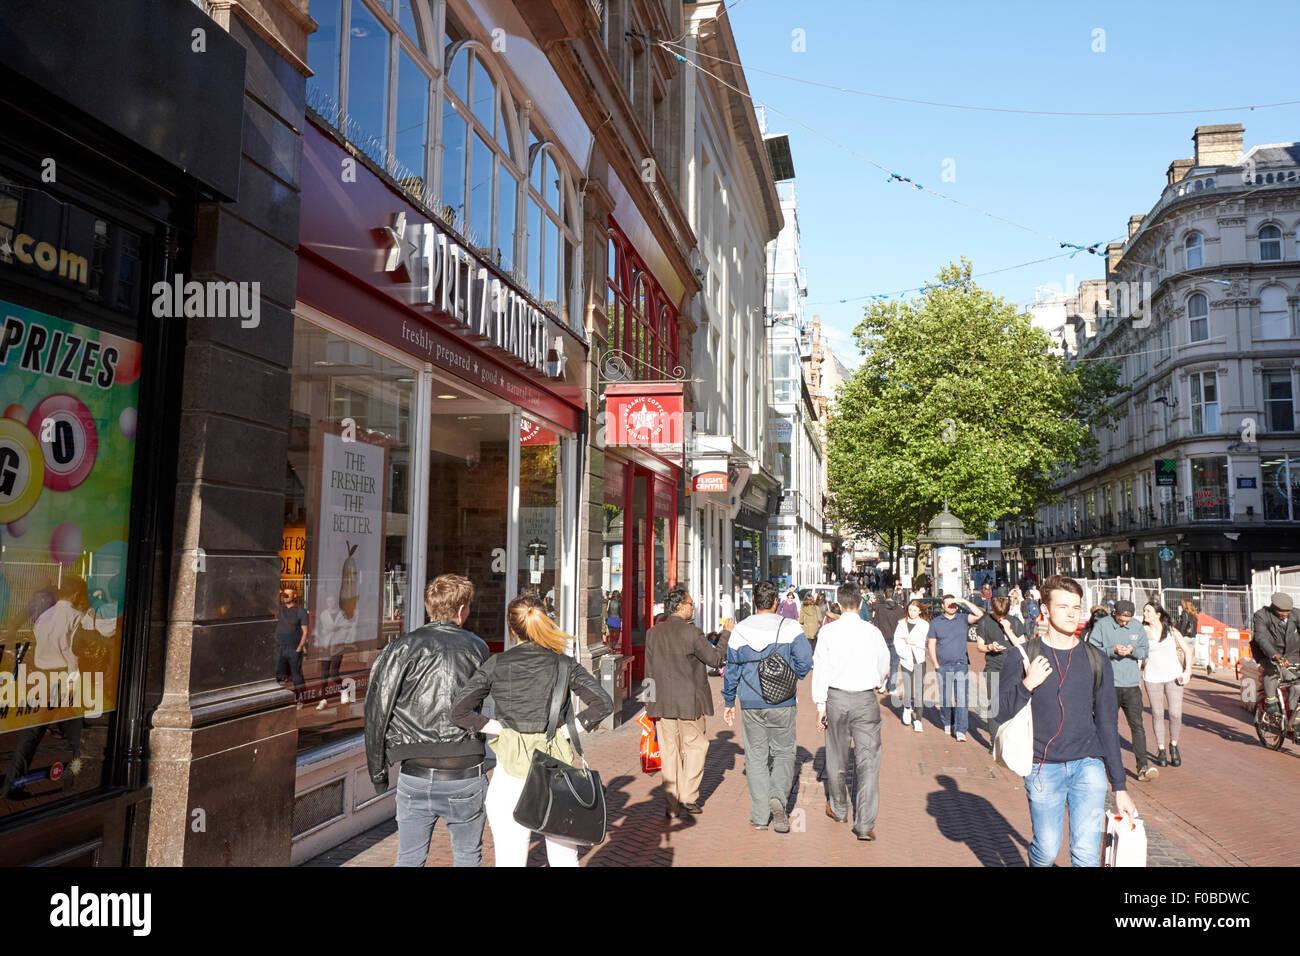 busy new street shopping area Birmingham city centre UK - Stock Image